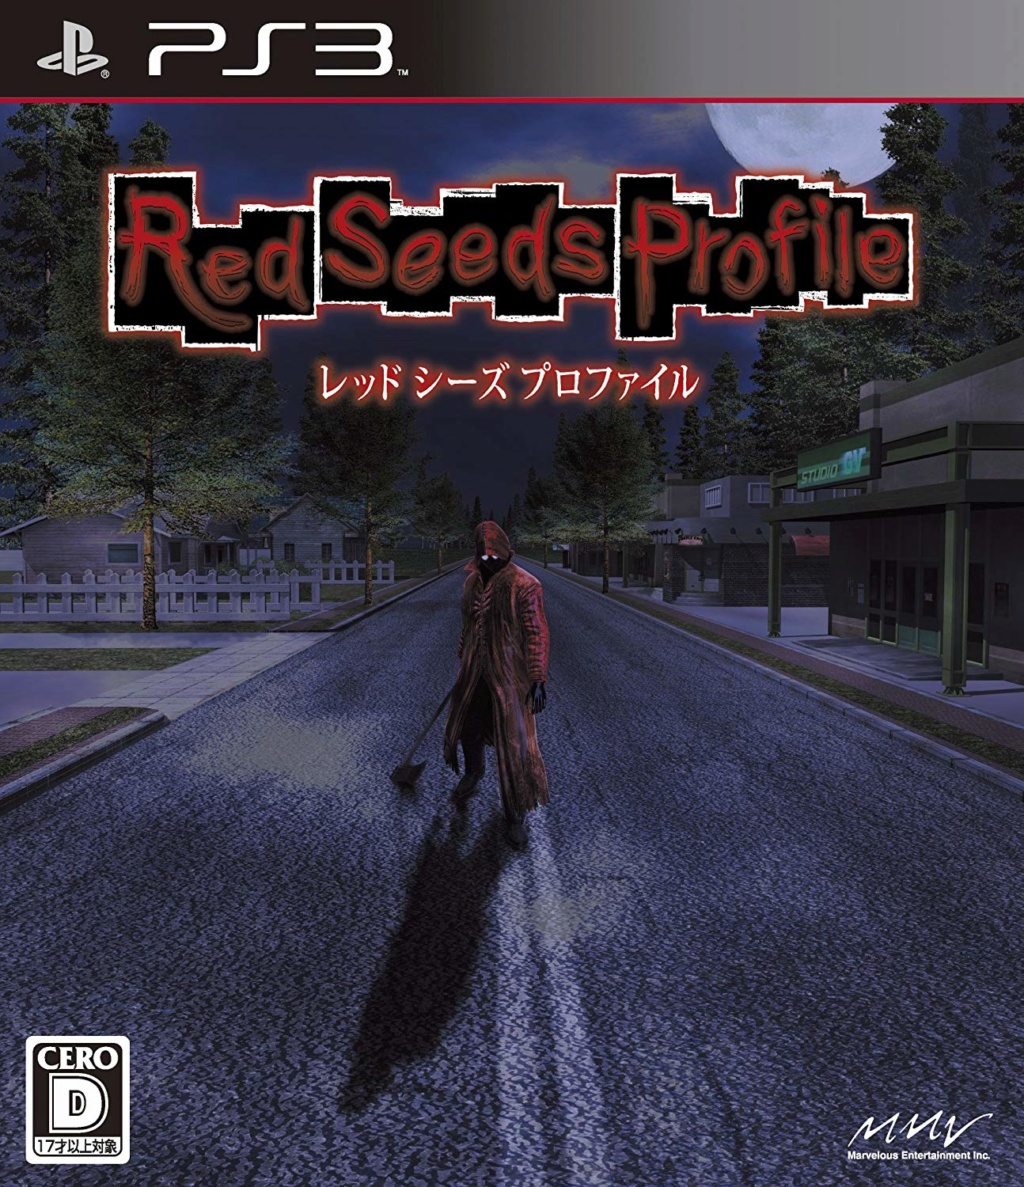 Deadly Premonition (PS3/X360) - Page 2 91fhbq10